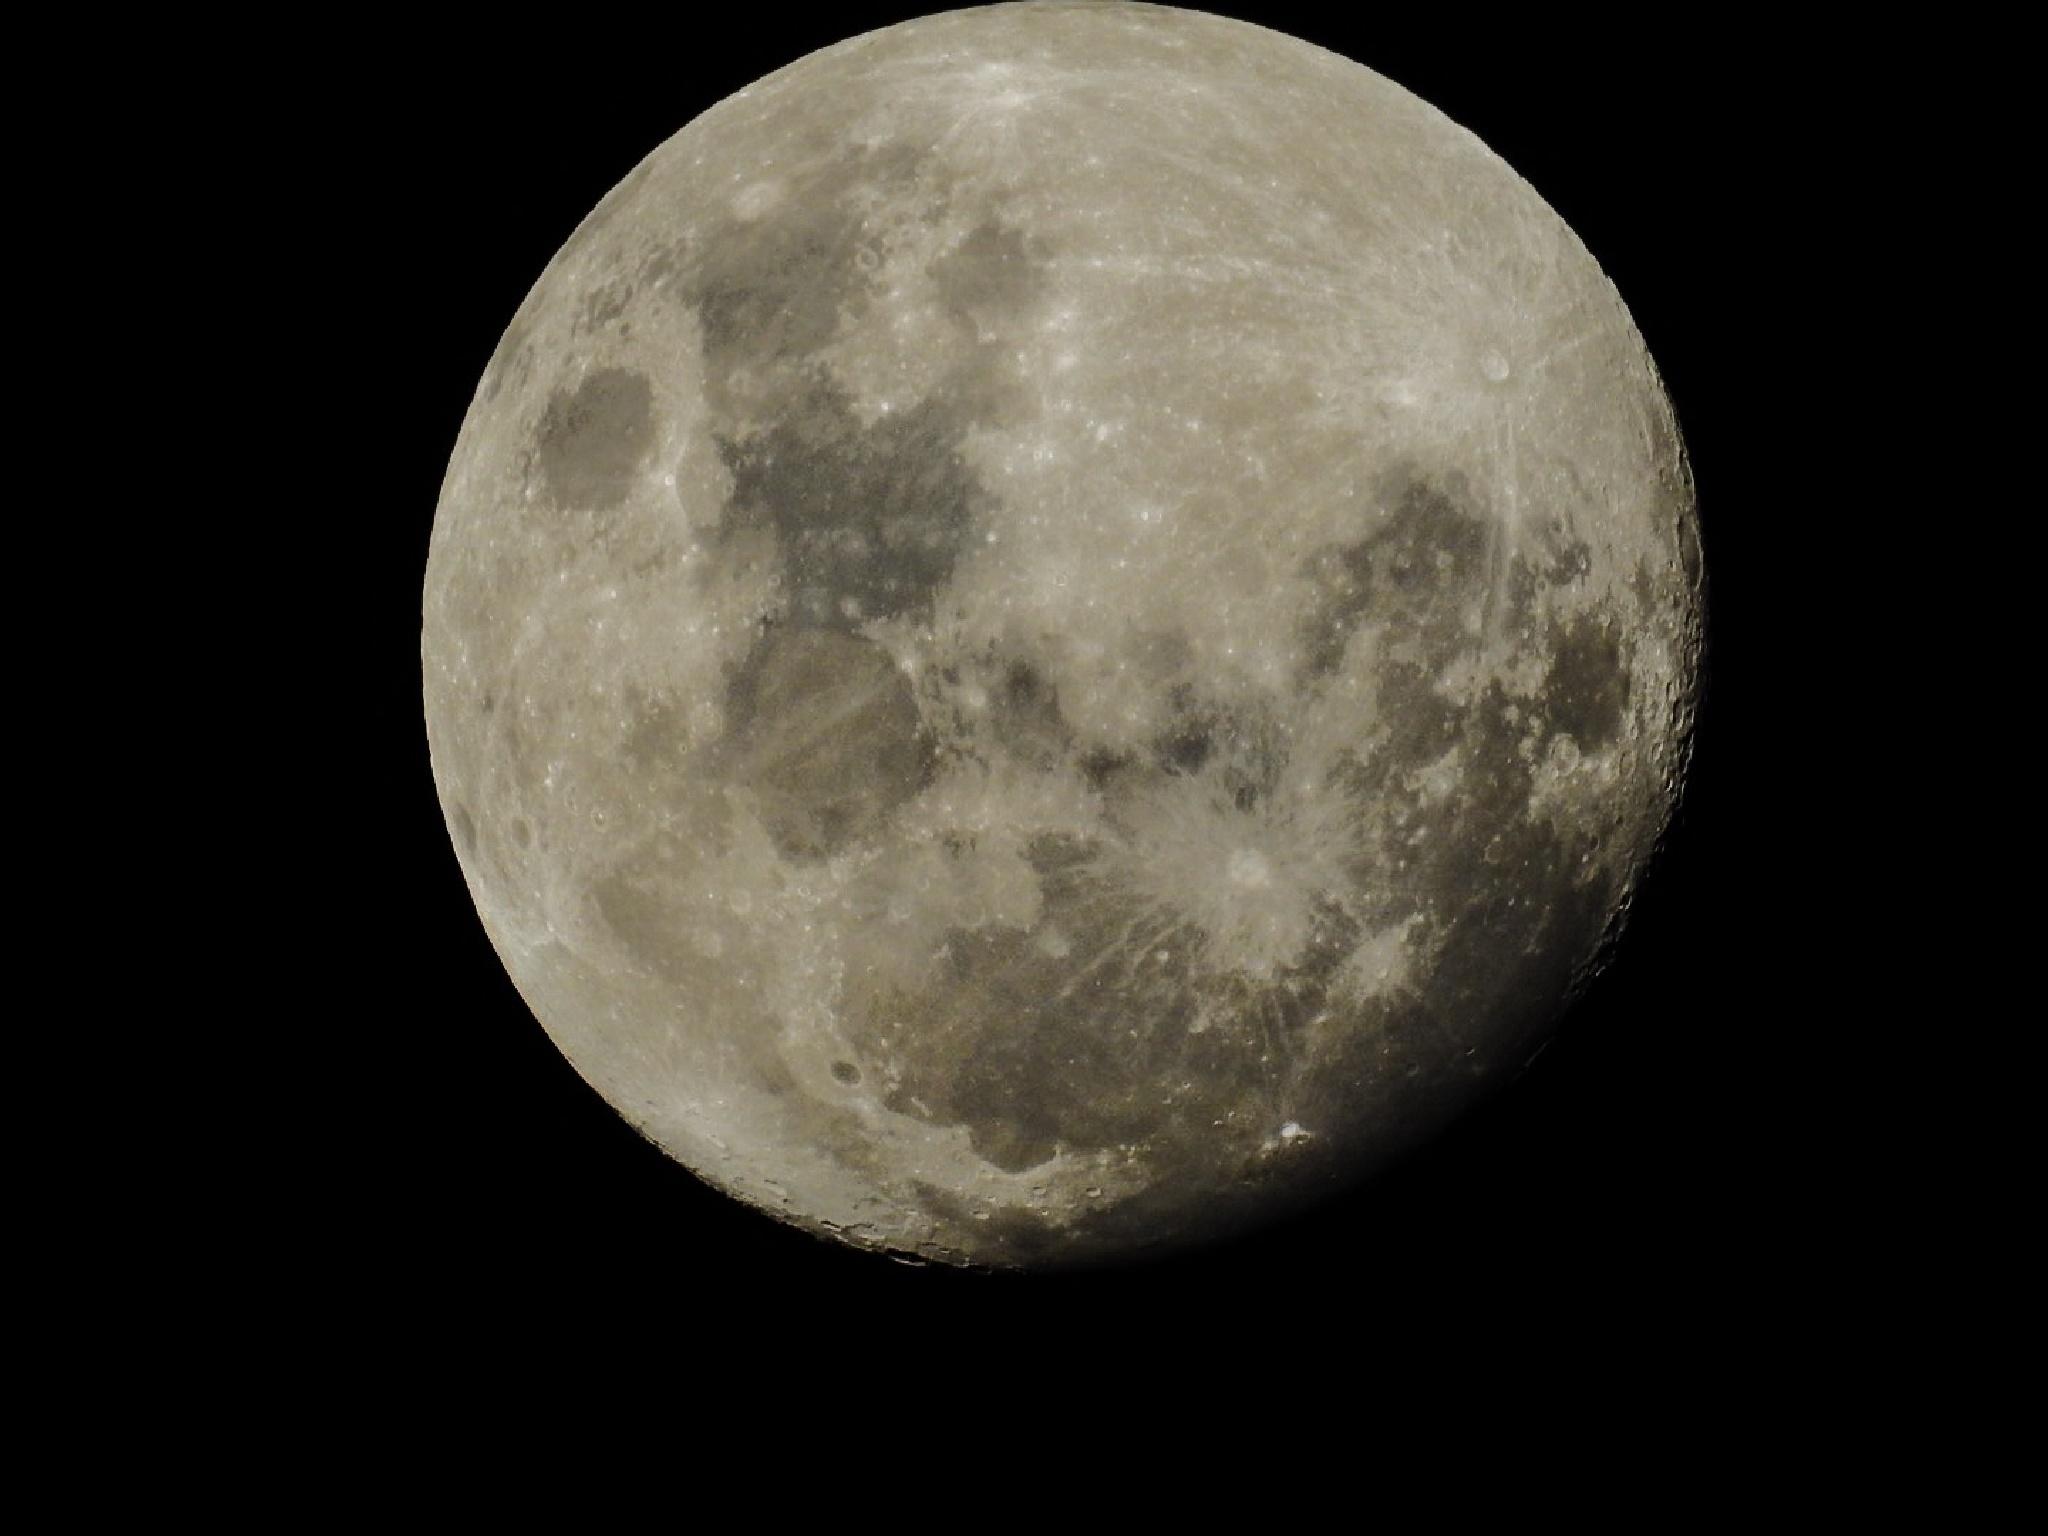 Tonight's moon by Dickynee